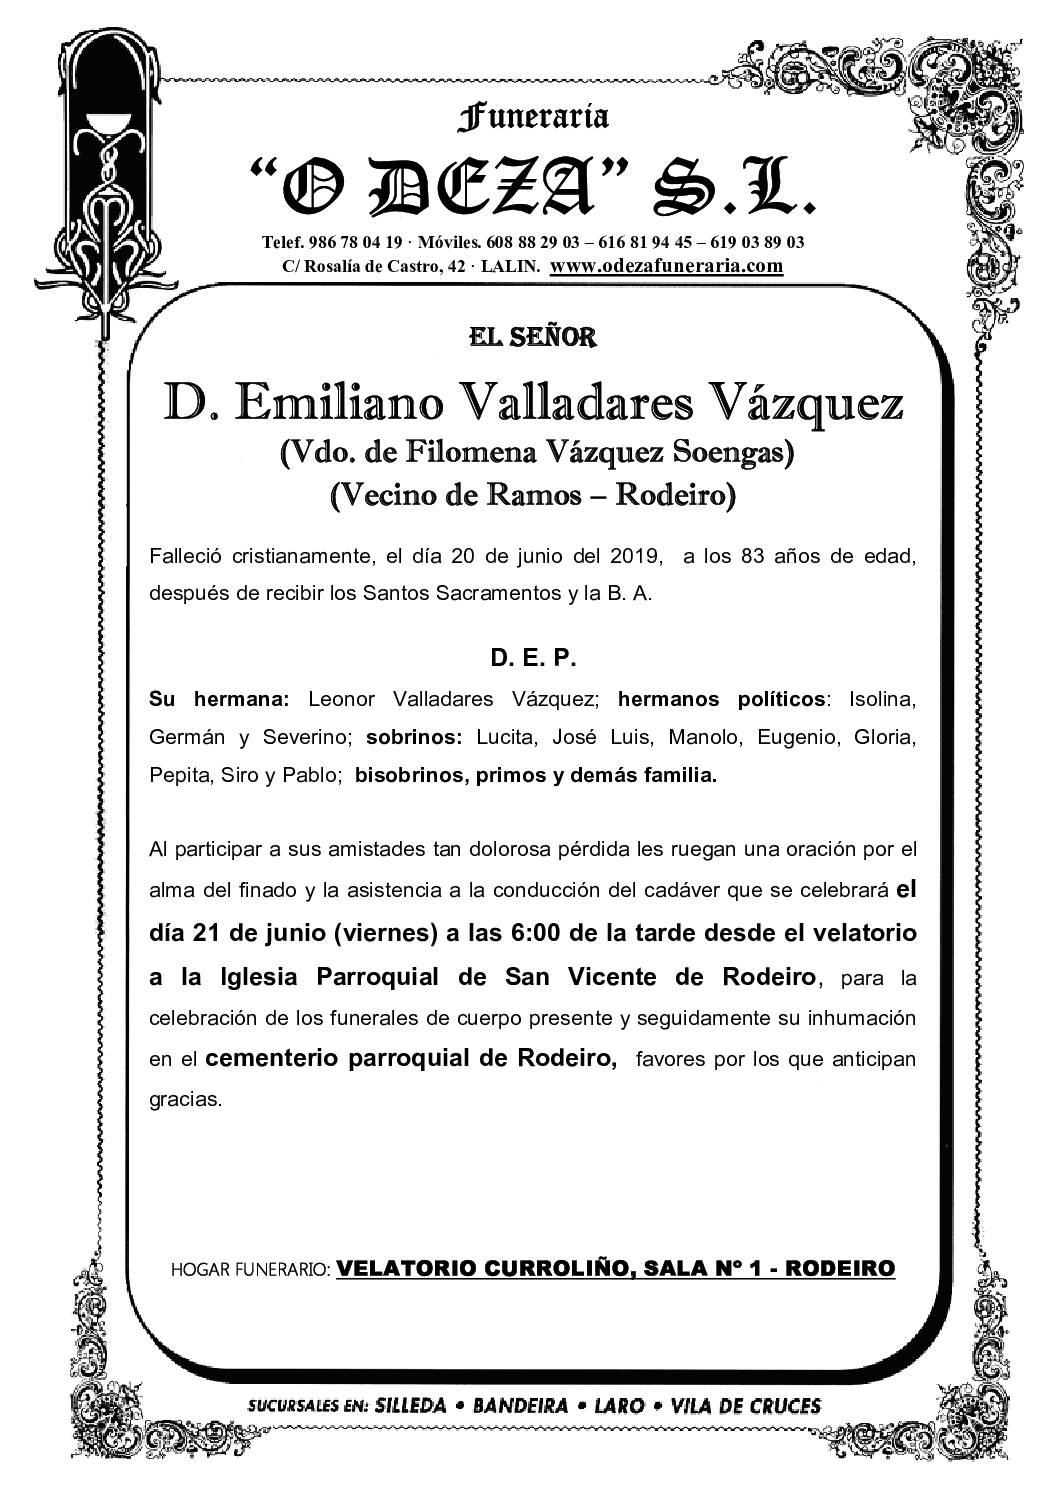 D. EMILIANO VALLADARES VÁZQUEZ